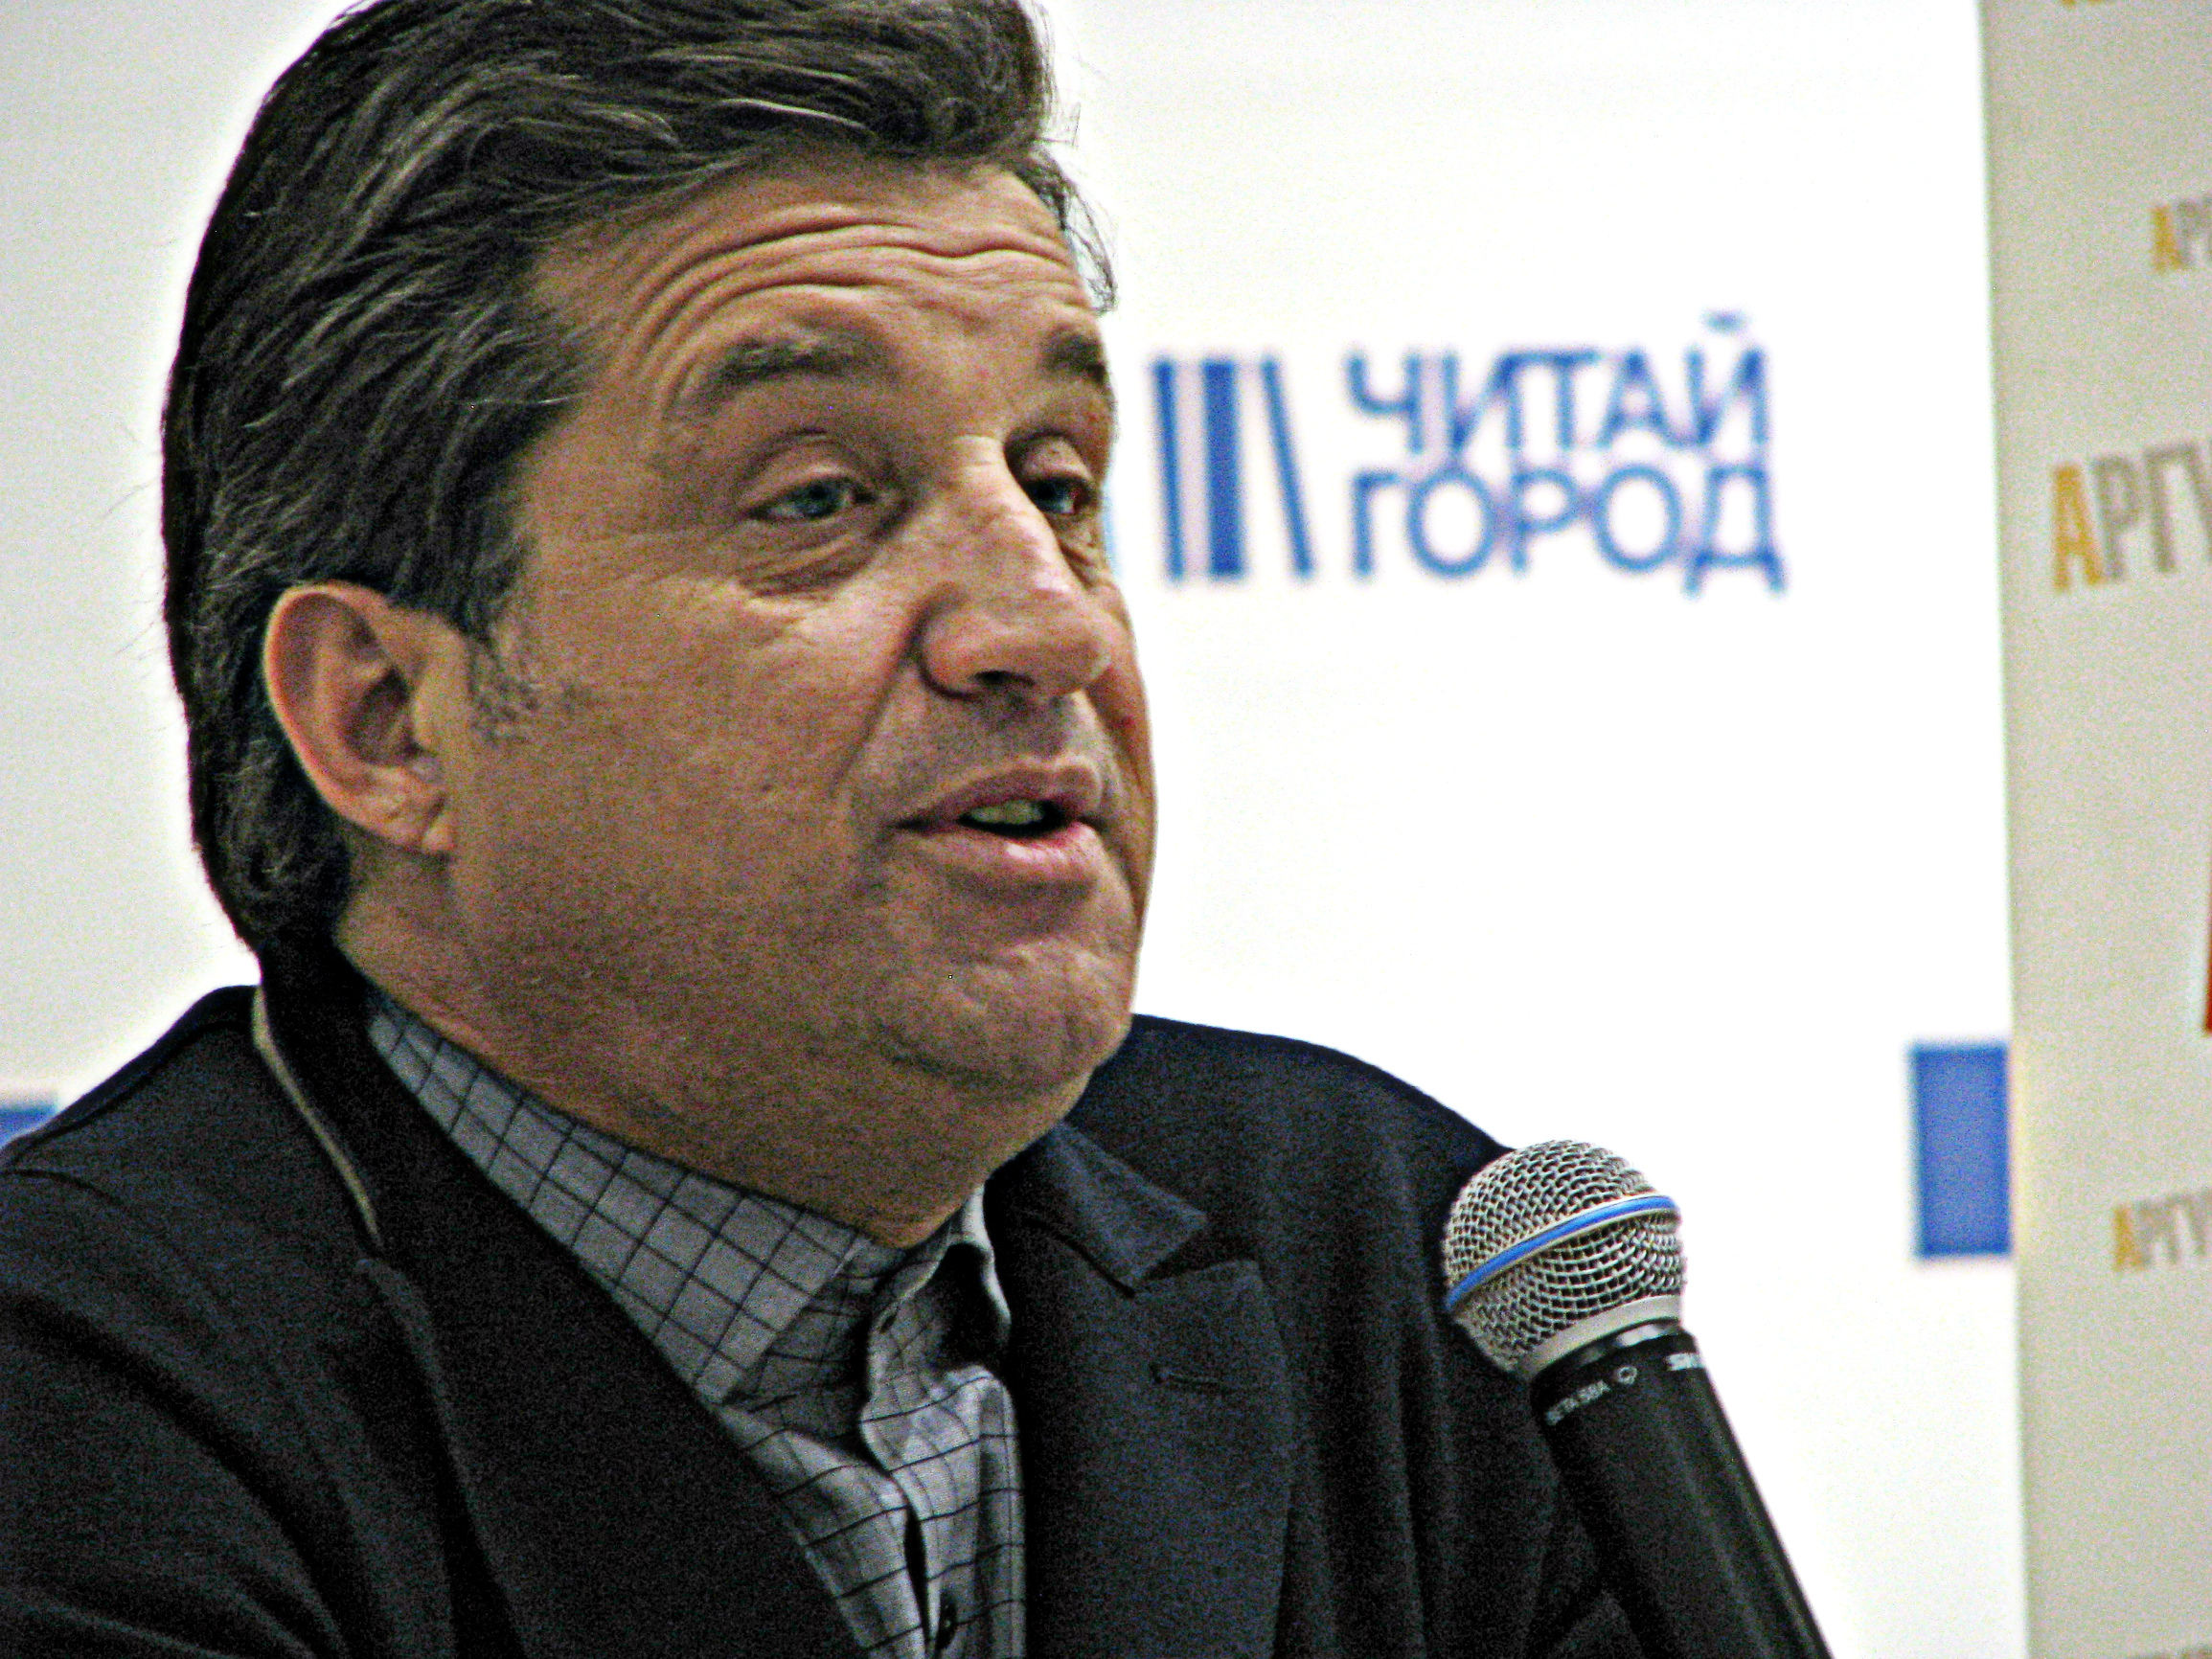 Отар Кушанашвили (Otar Kushanashvili Персонаж: фото) 68